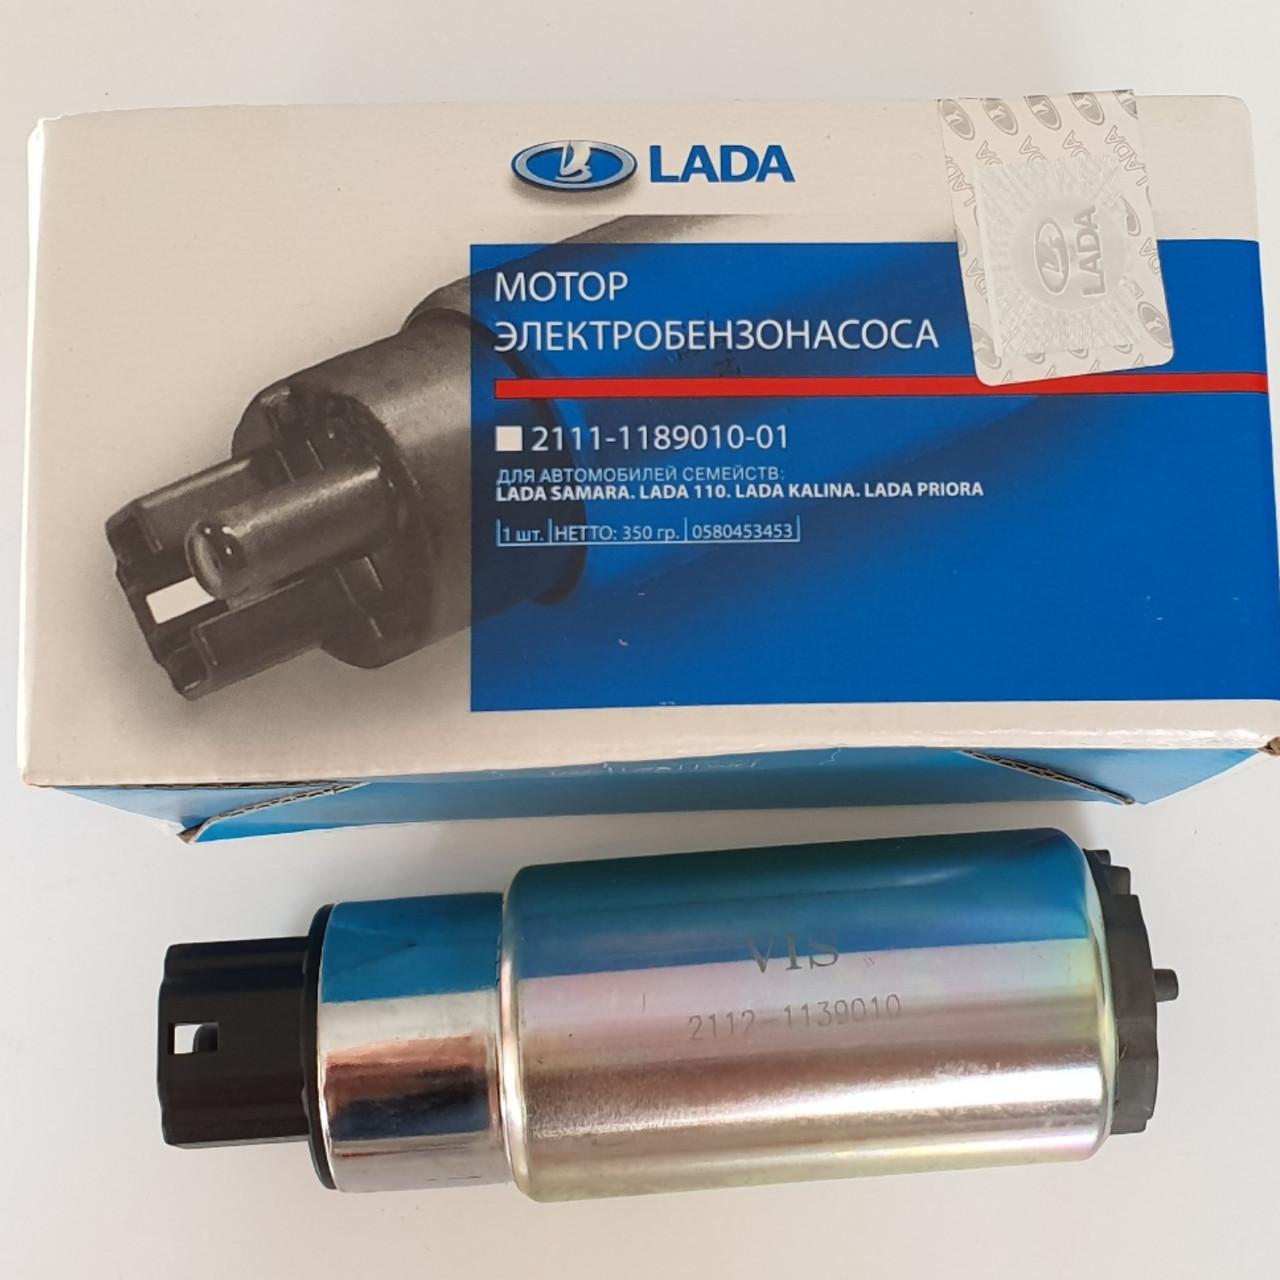 Мотор электробензонасоса ВАЗ 2110,2111,2112 (1,5) АвтоВАЗ